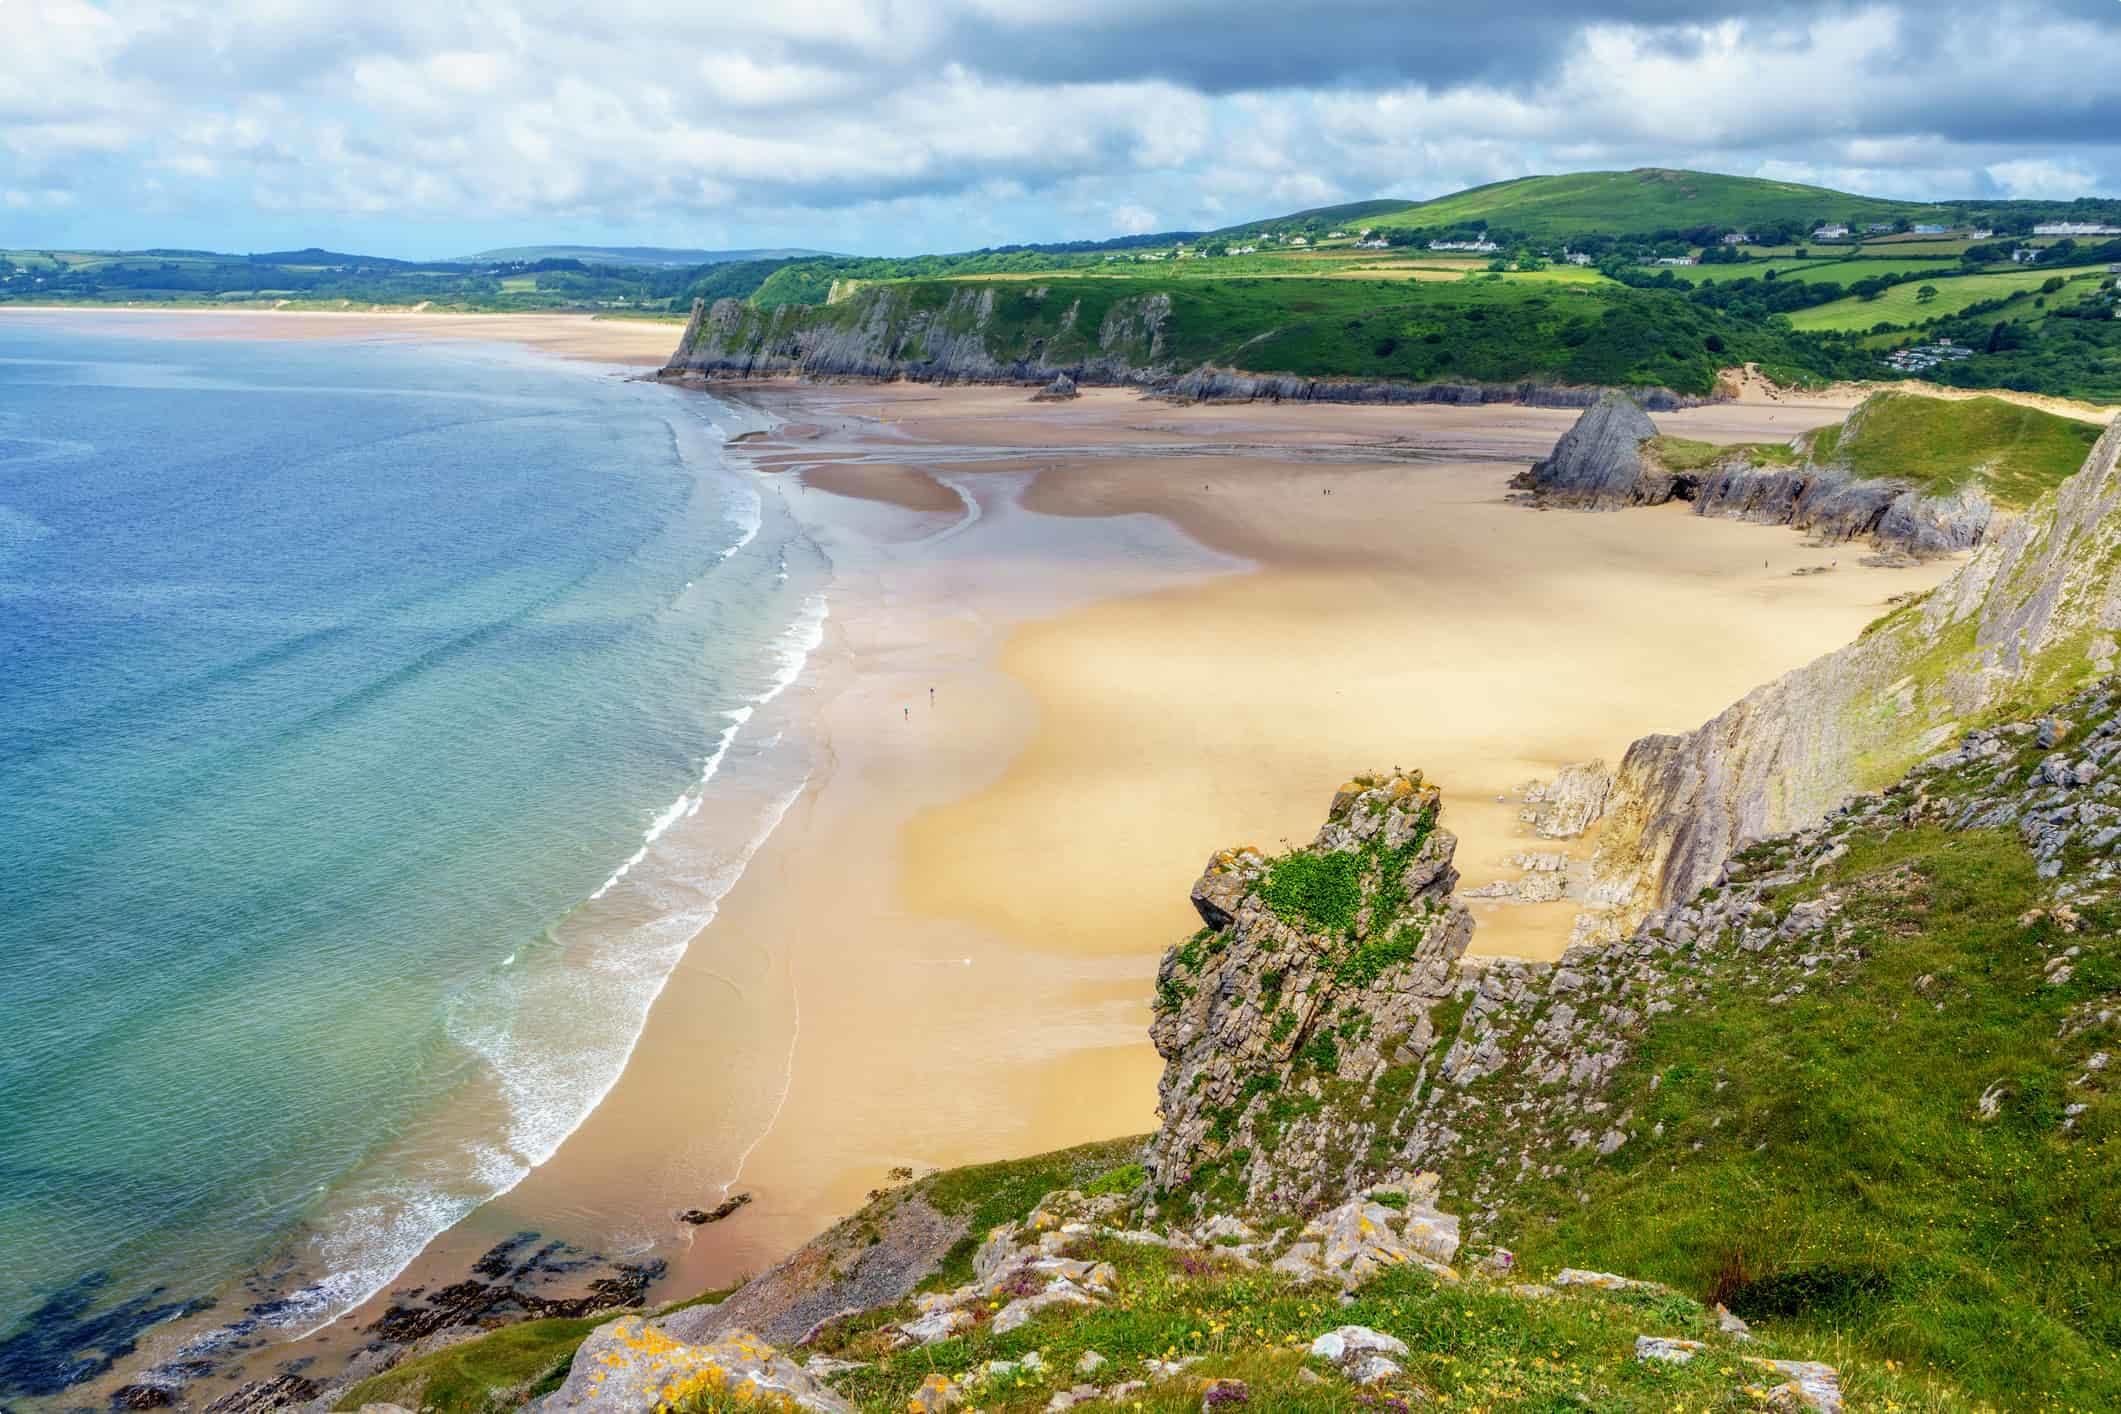 Three Cliffs Bay on Gower Peninsular, Wales, UK